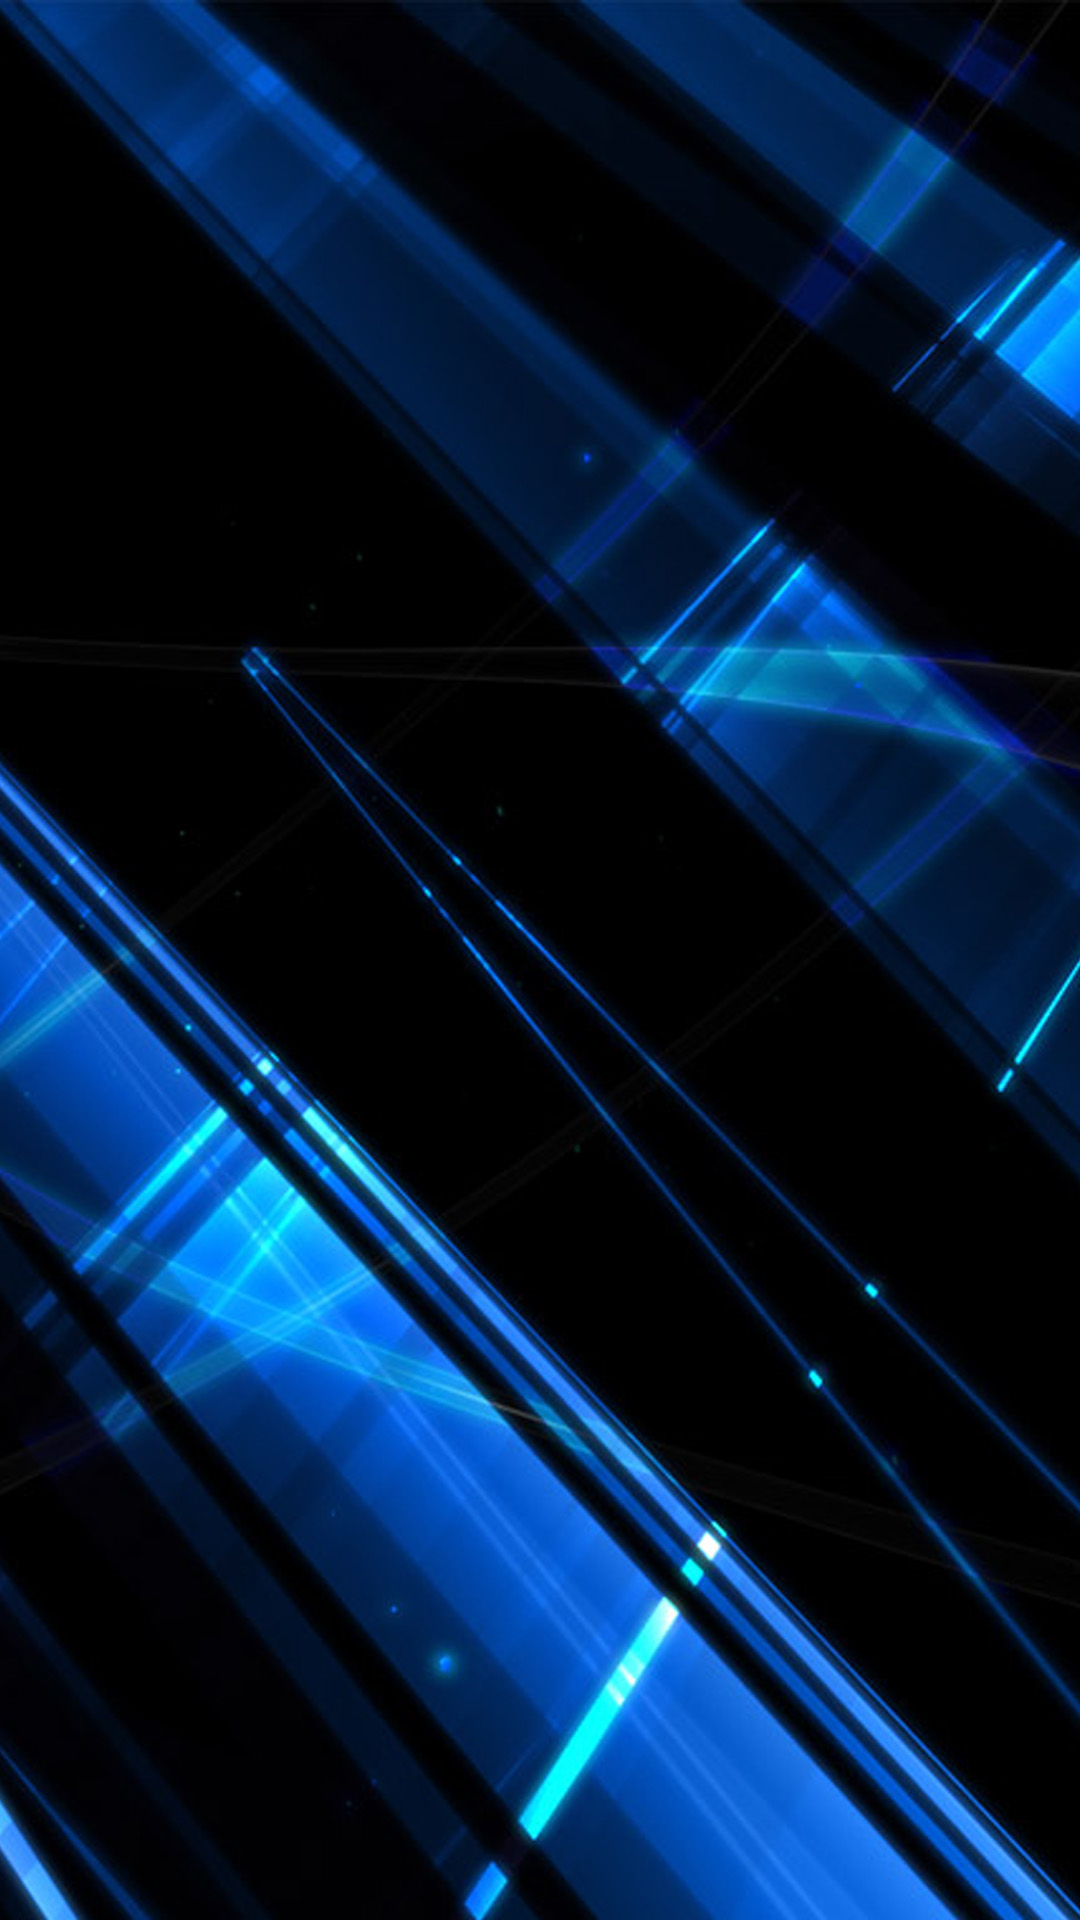 Blue angel iphone 6 plus Wallpaper iPhone 6 Plus Wallpapers HD 1080x1920